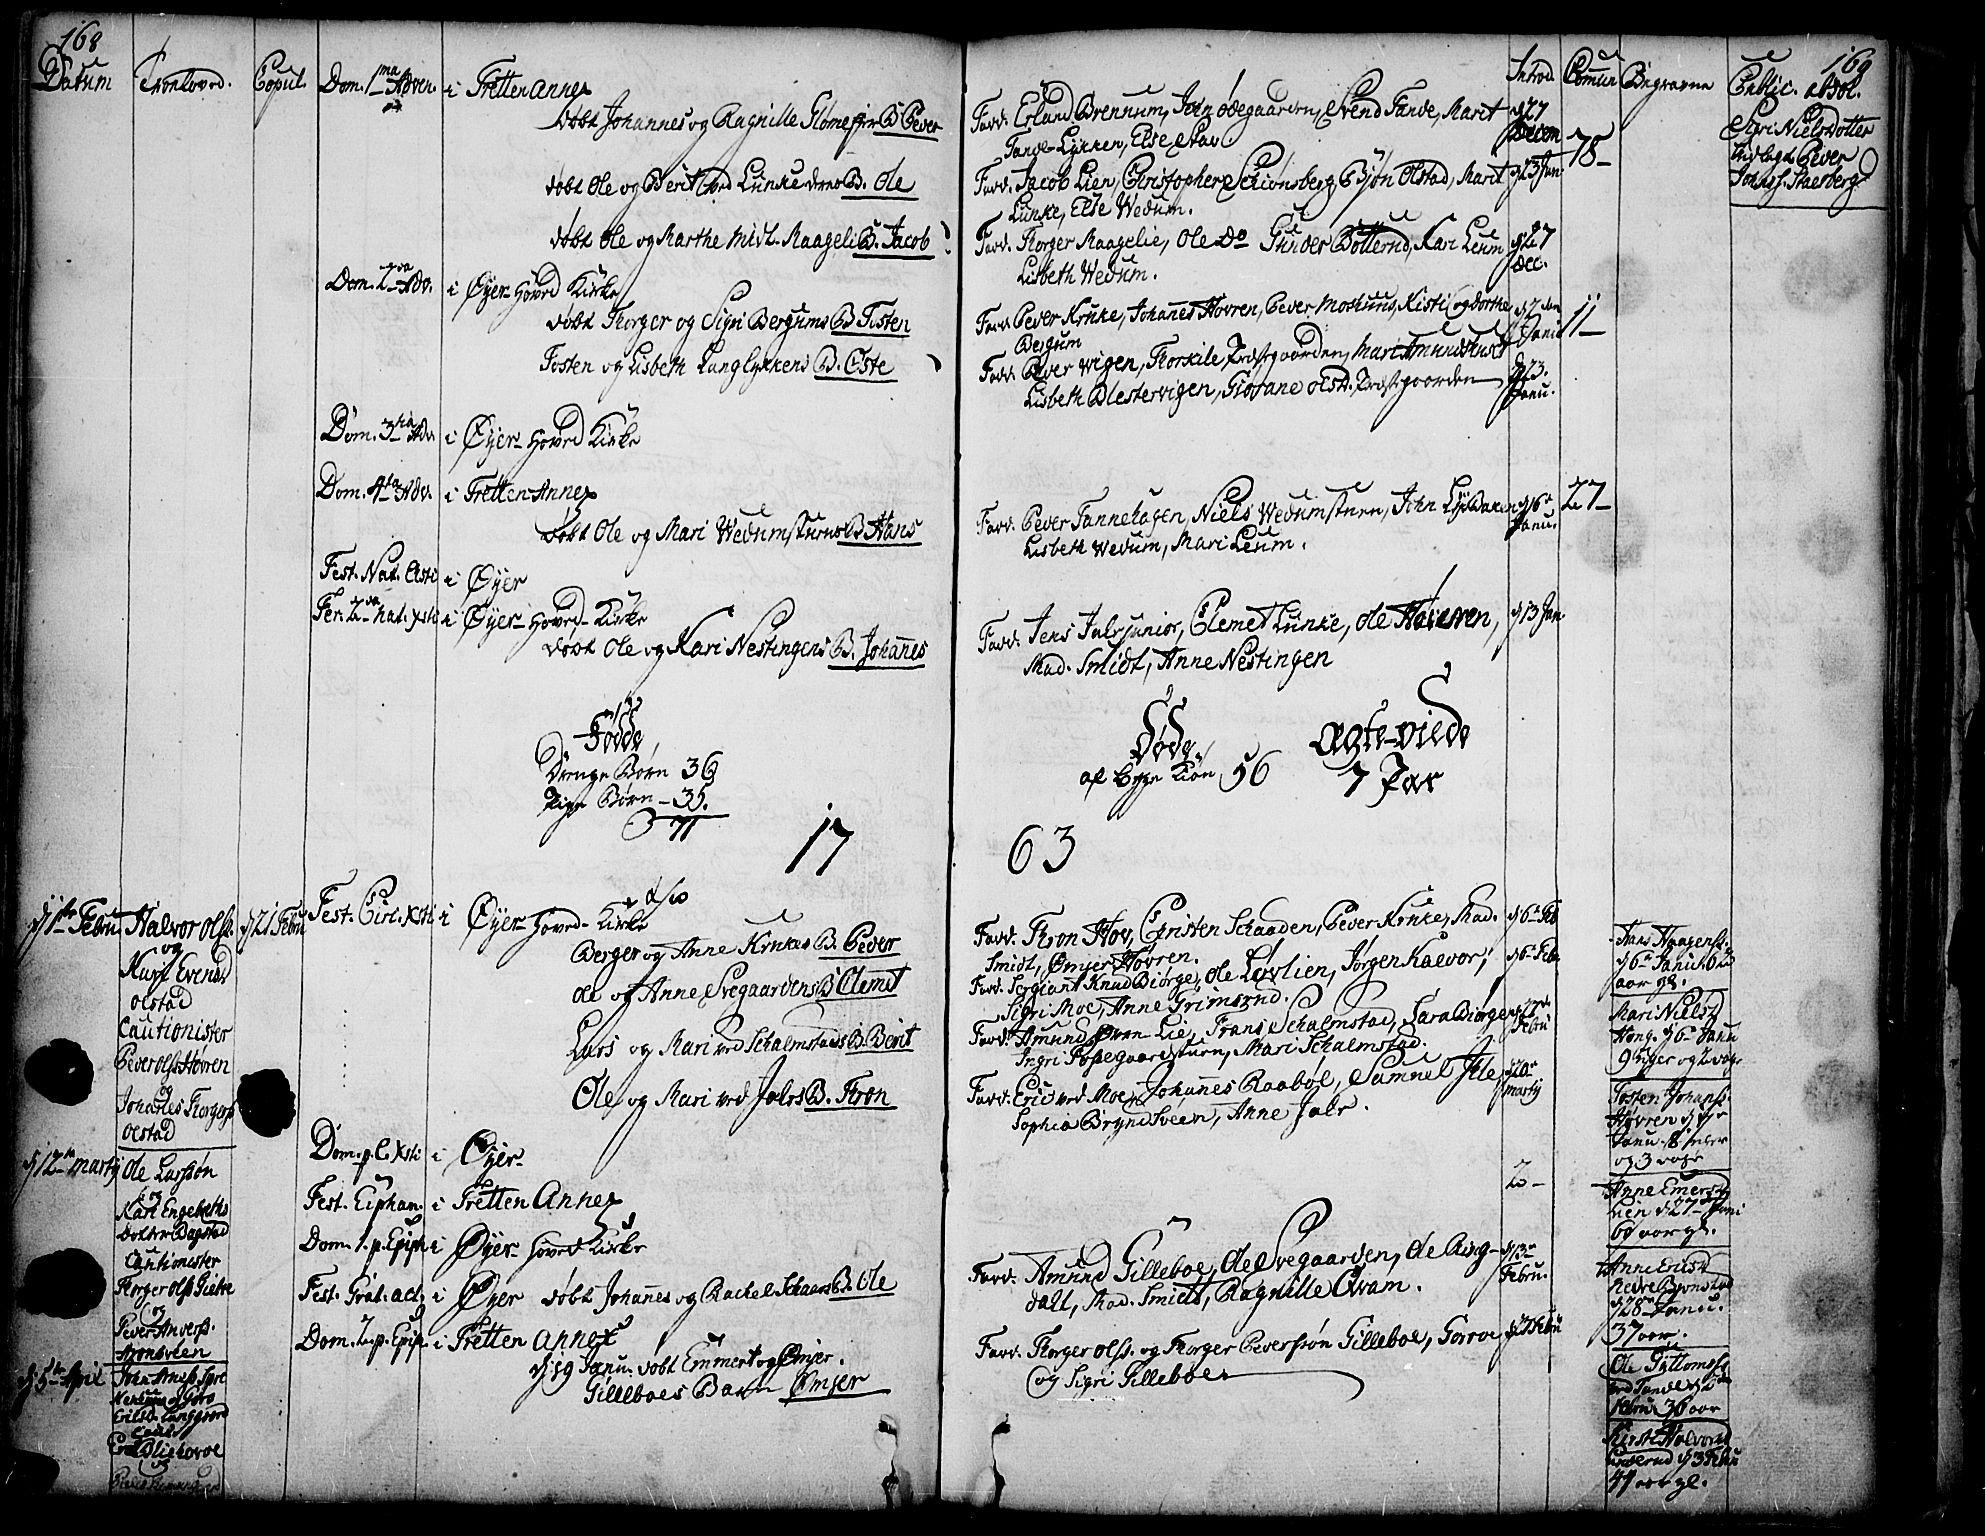 SAH, Øyer prestekontor, Ministerialbok nr. 2, 1733-1784, s. 168-169